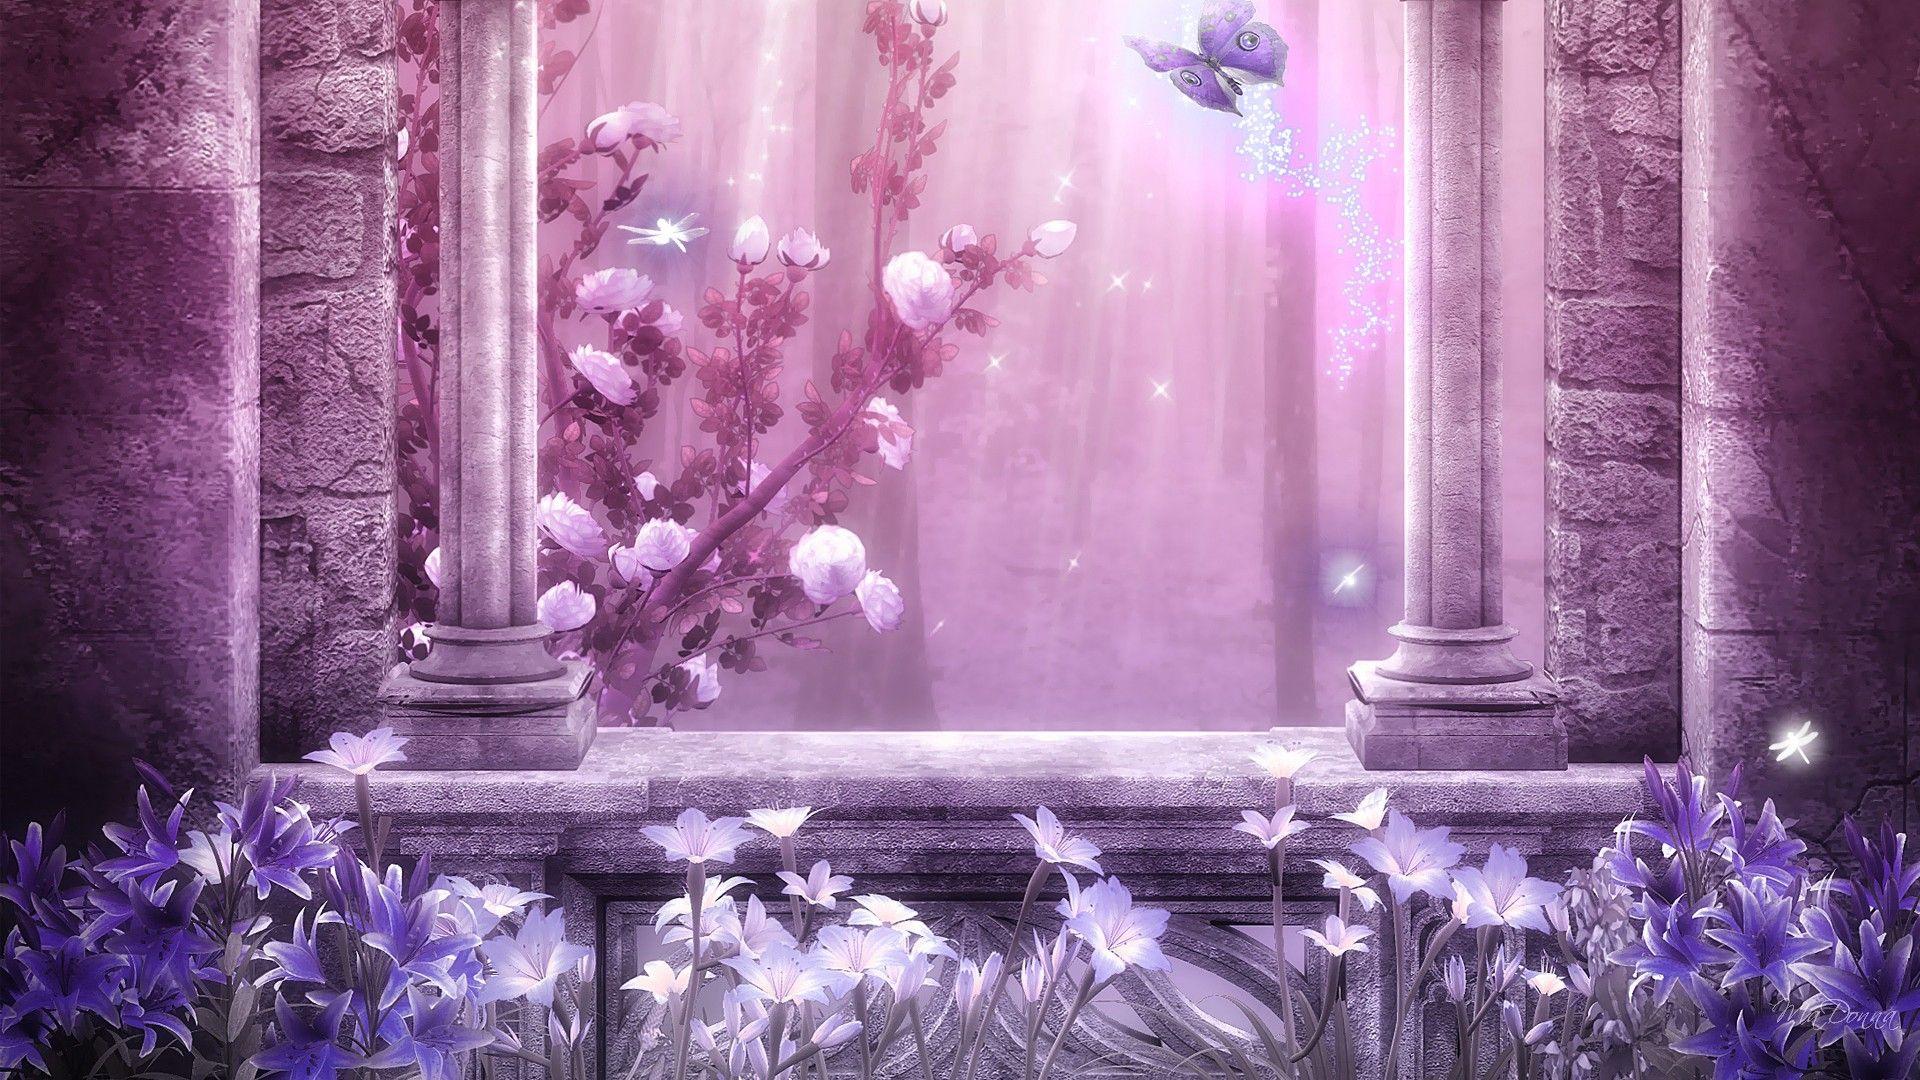 Pink Mystic Wallpaper Free Mystic Wallpaper Beautiful Flowers Pictures Rose Wallpaper Flower wallpapers full hd fantasy